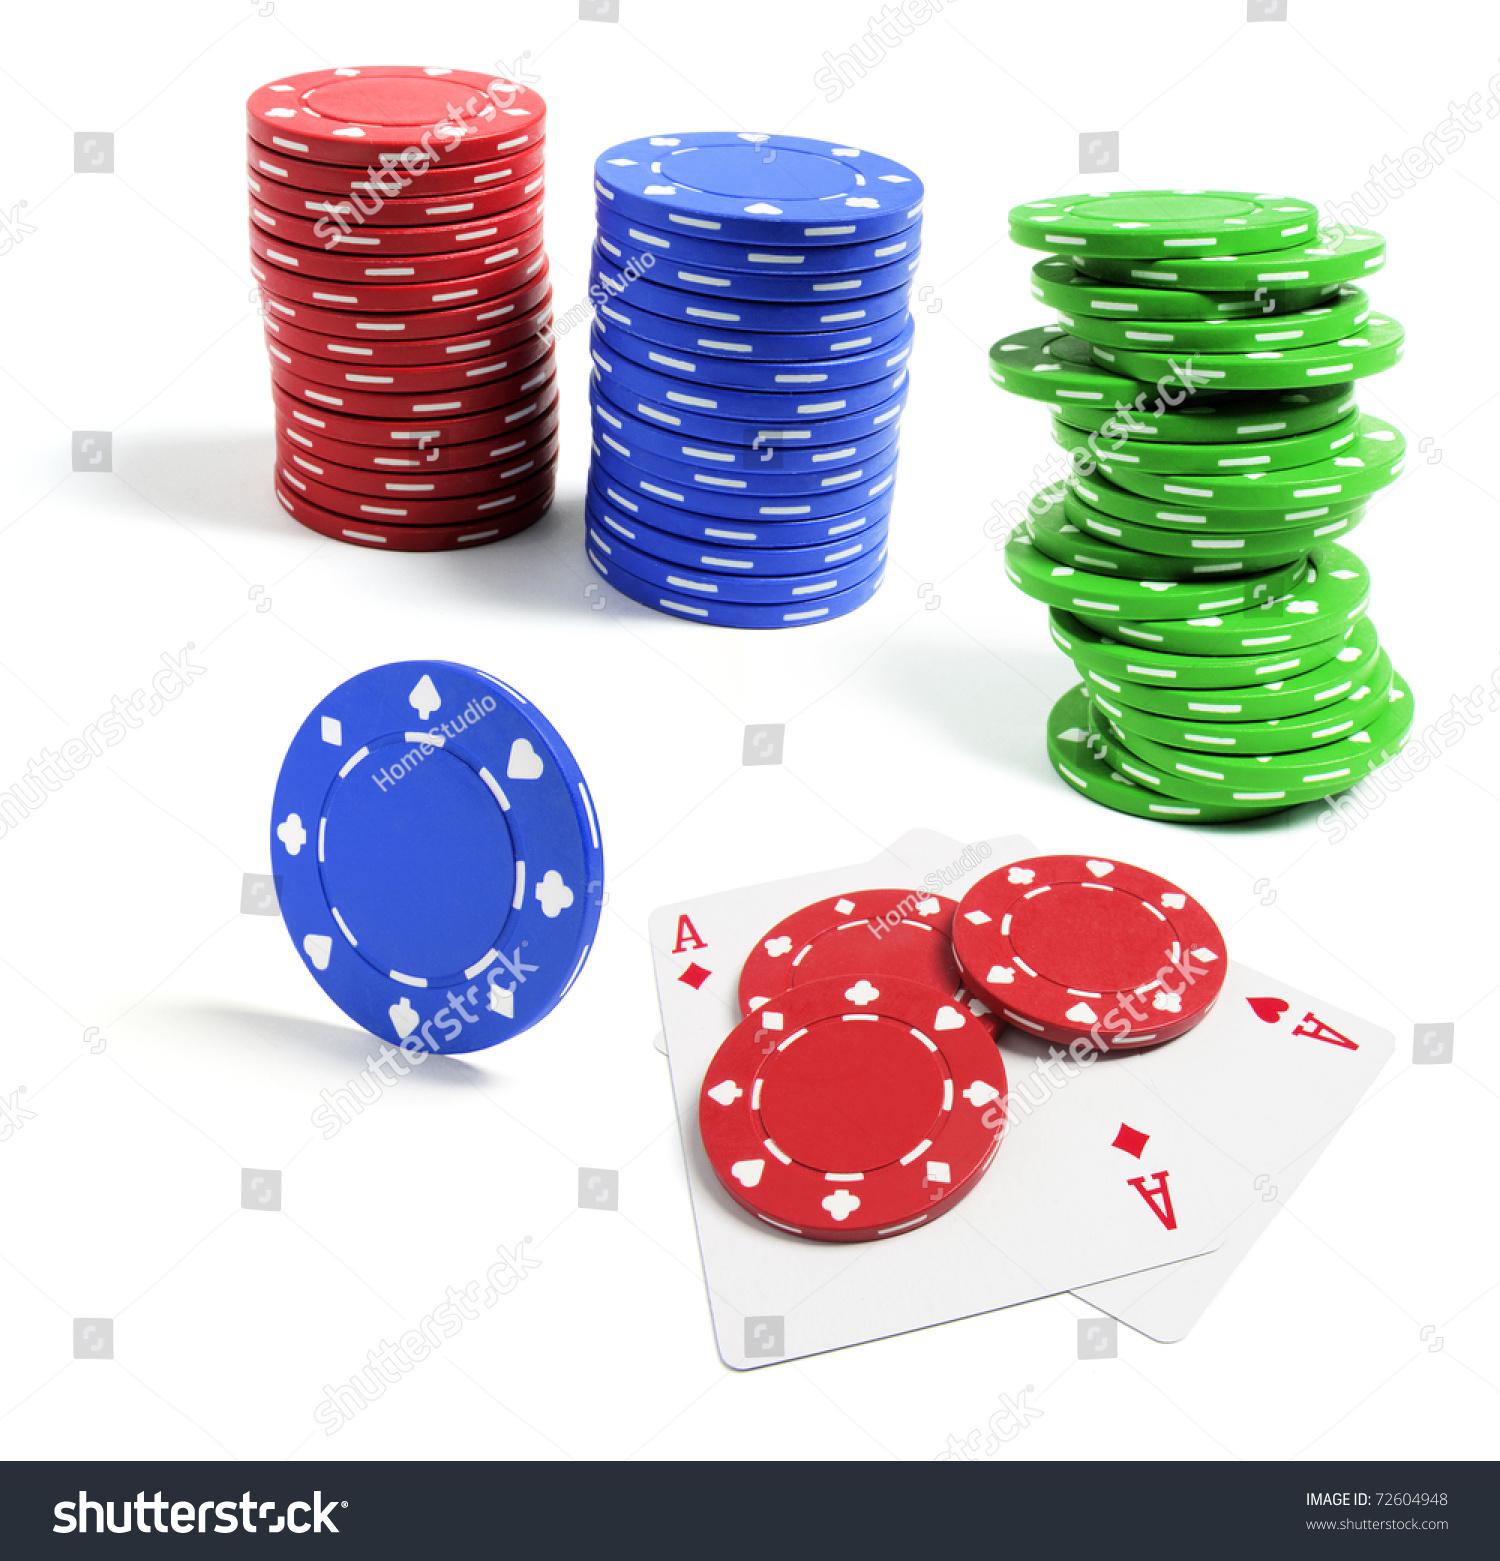 Small denomination poker chips